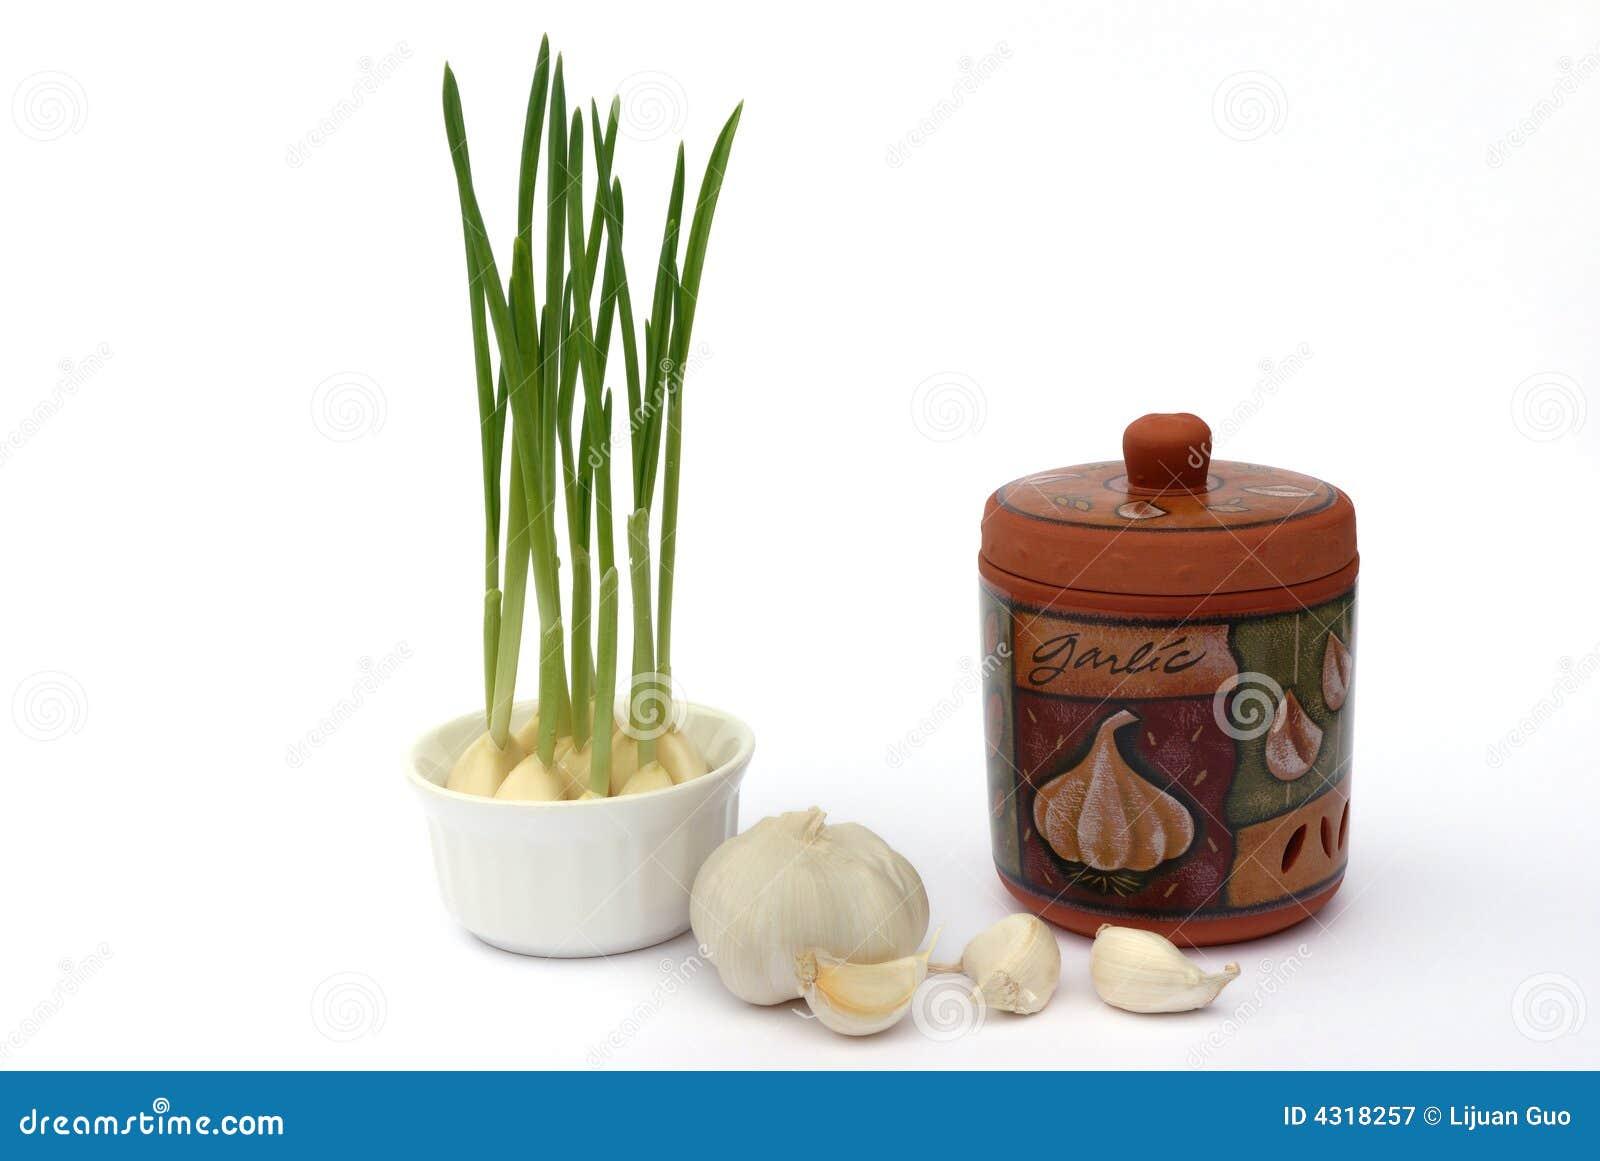 Garlic and garlic keeper